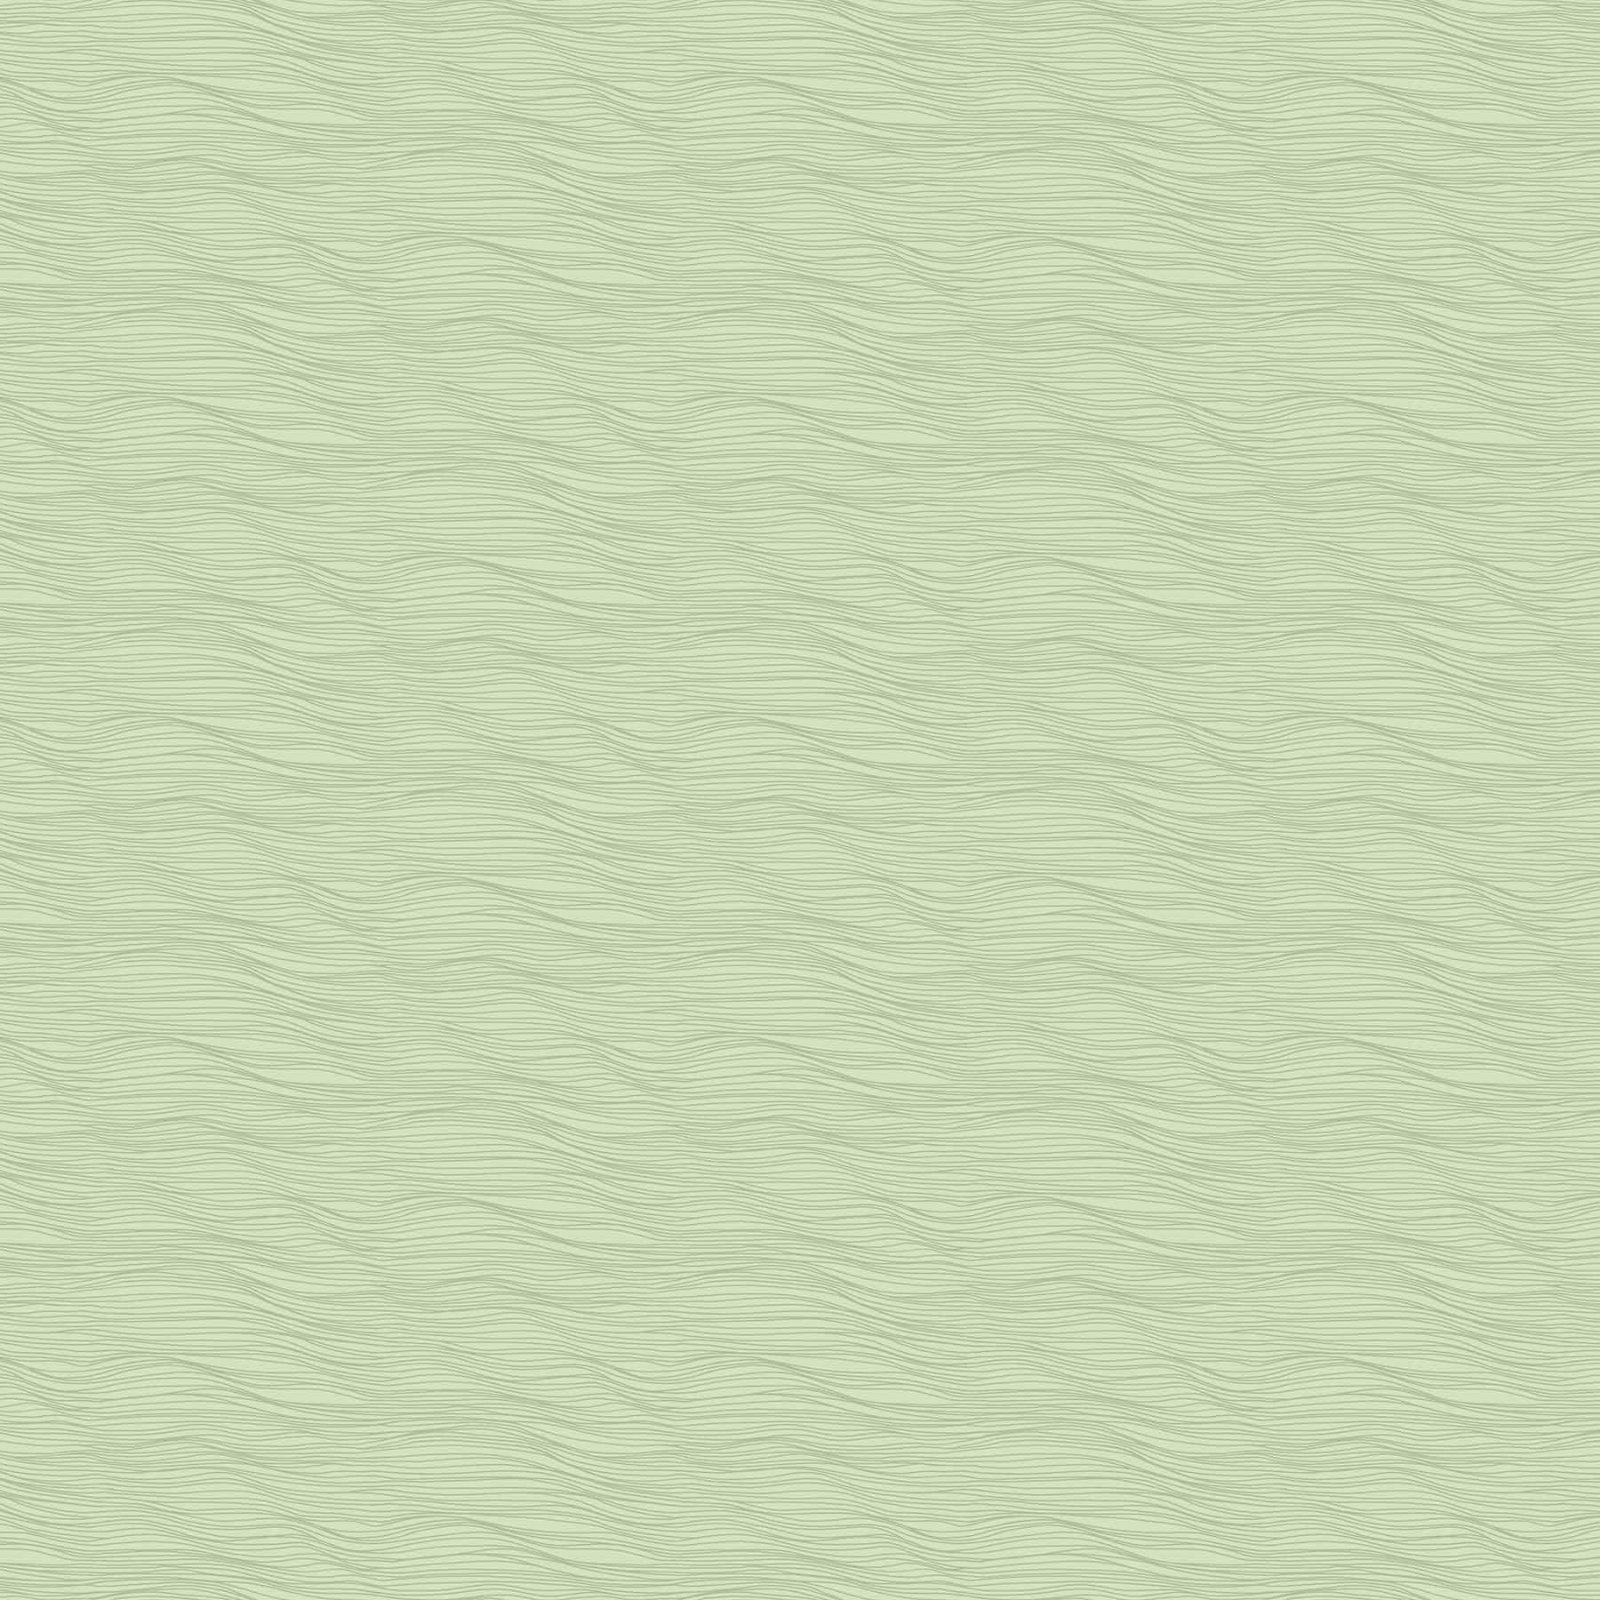 Mint Green - Water - FIGO Elements - 92008 70